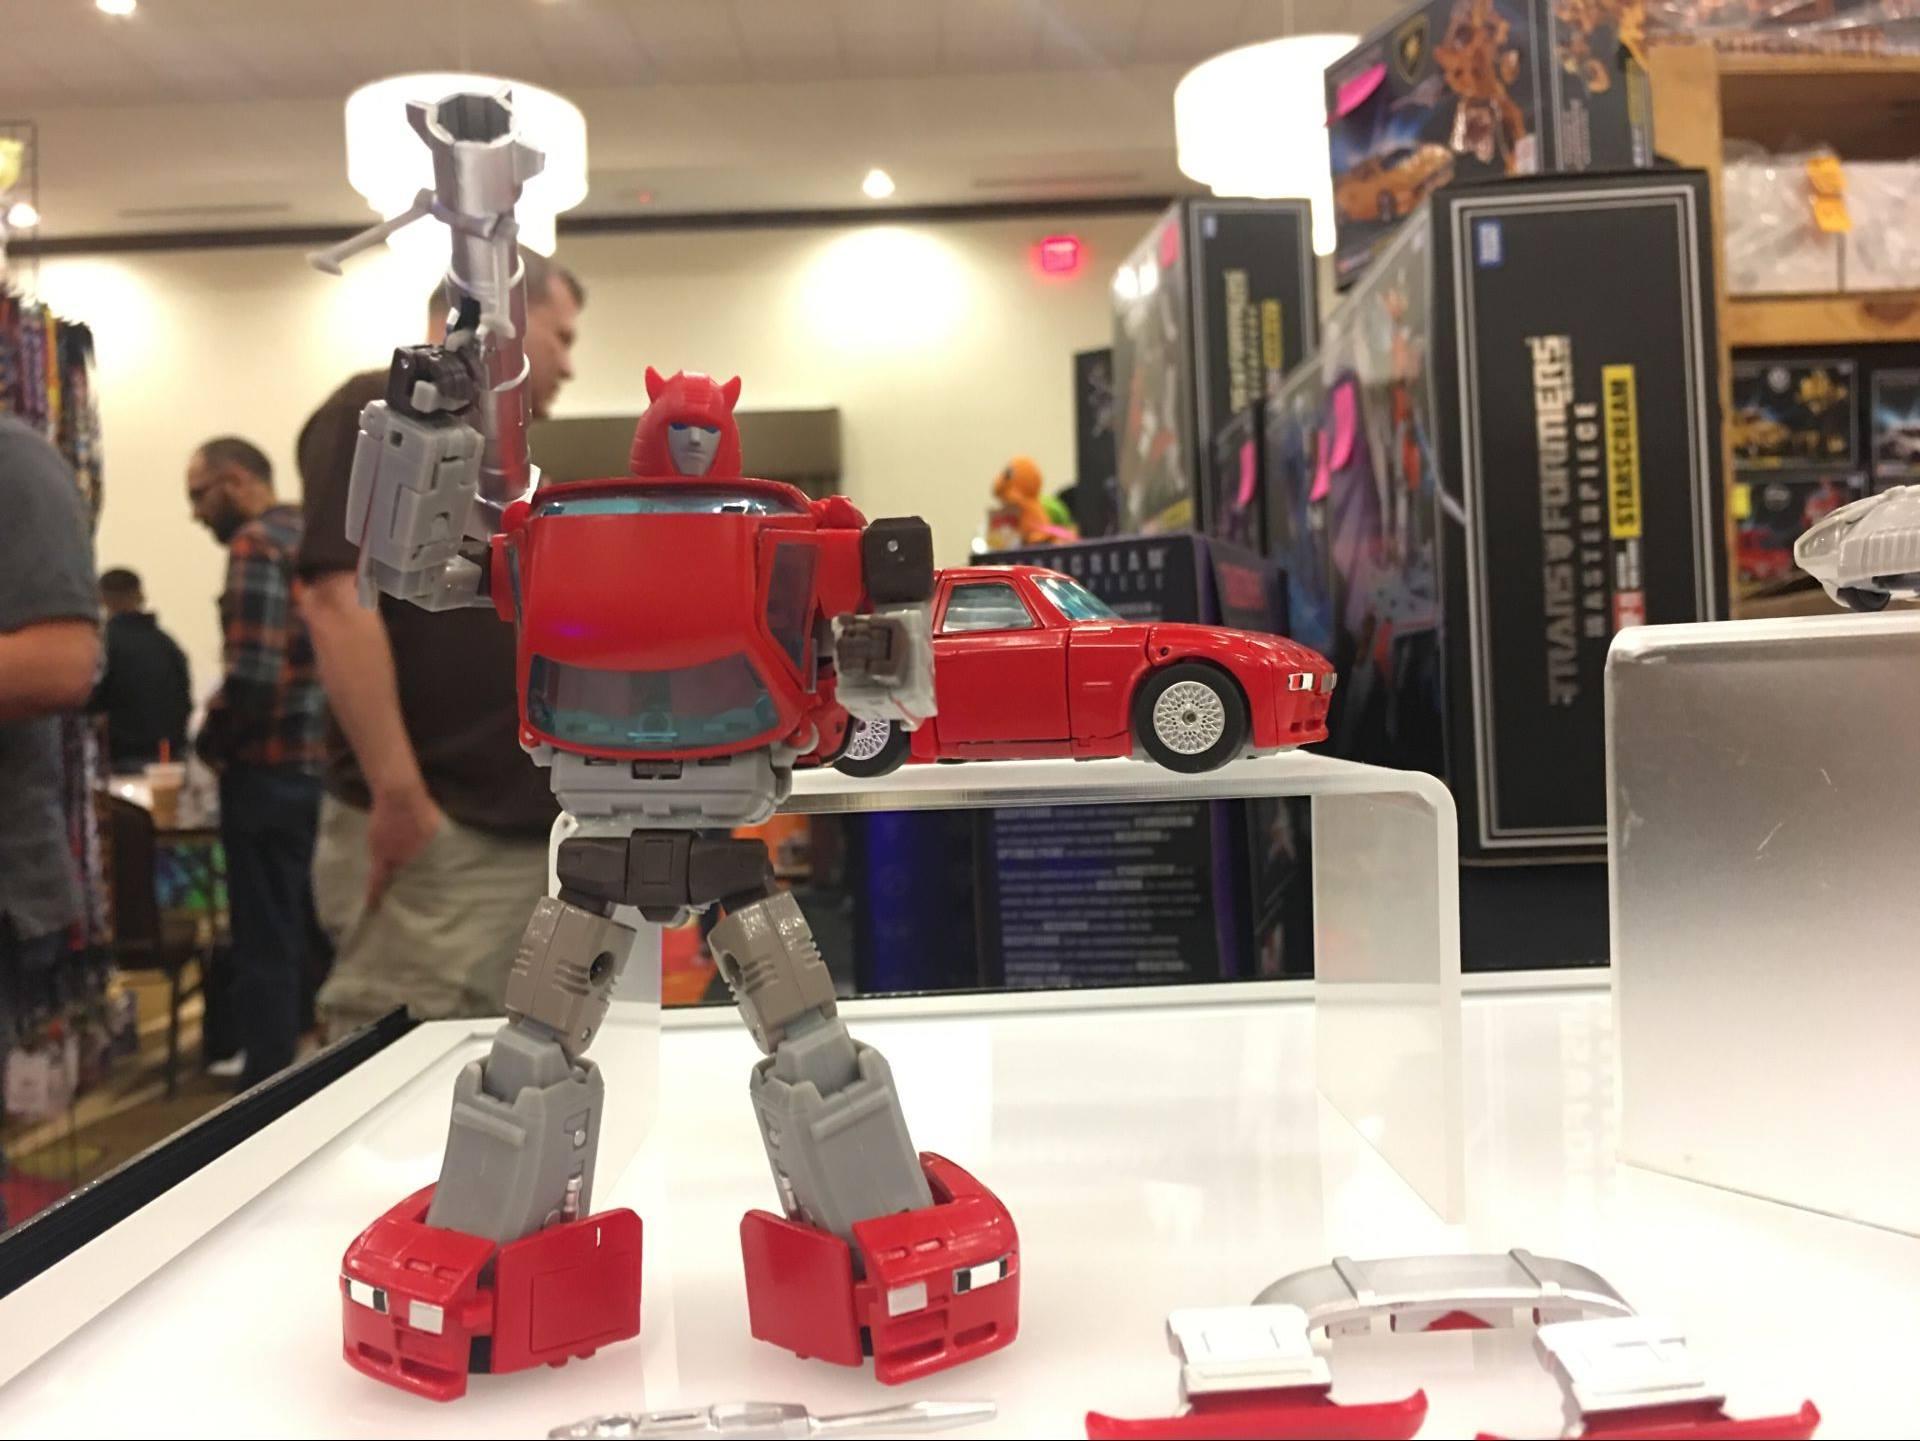 [Ocular Max] Produit Tiers - Minibots MP - PS-09 Hellion (aka Cliffjumper/Matamore), PS-11 Omne - (aka Cosmos) W62fsgNo_o